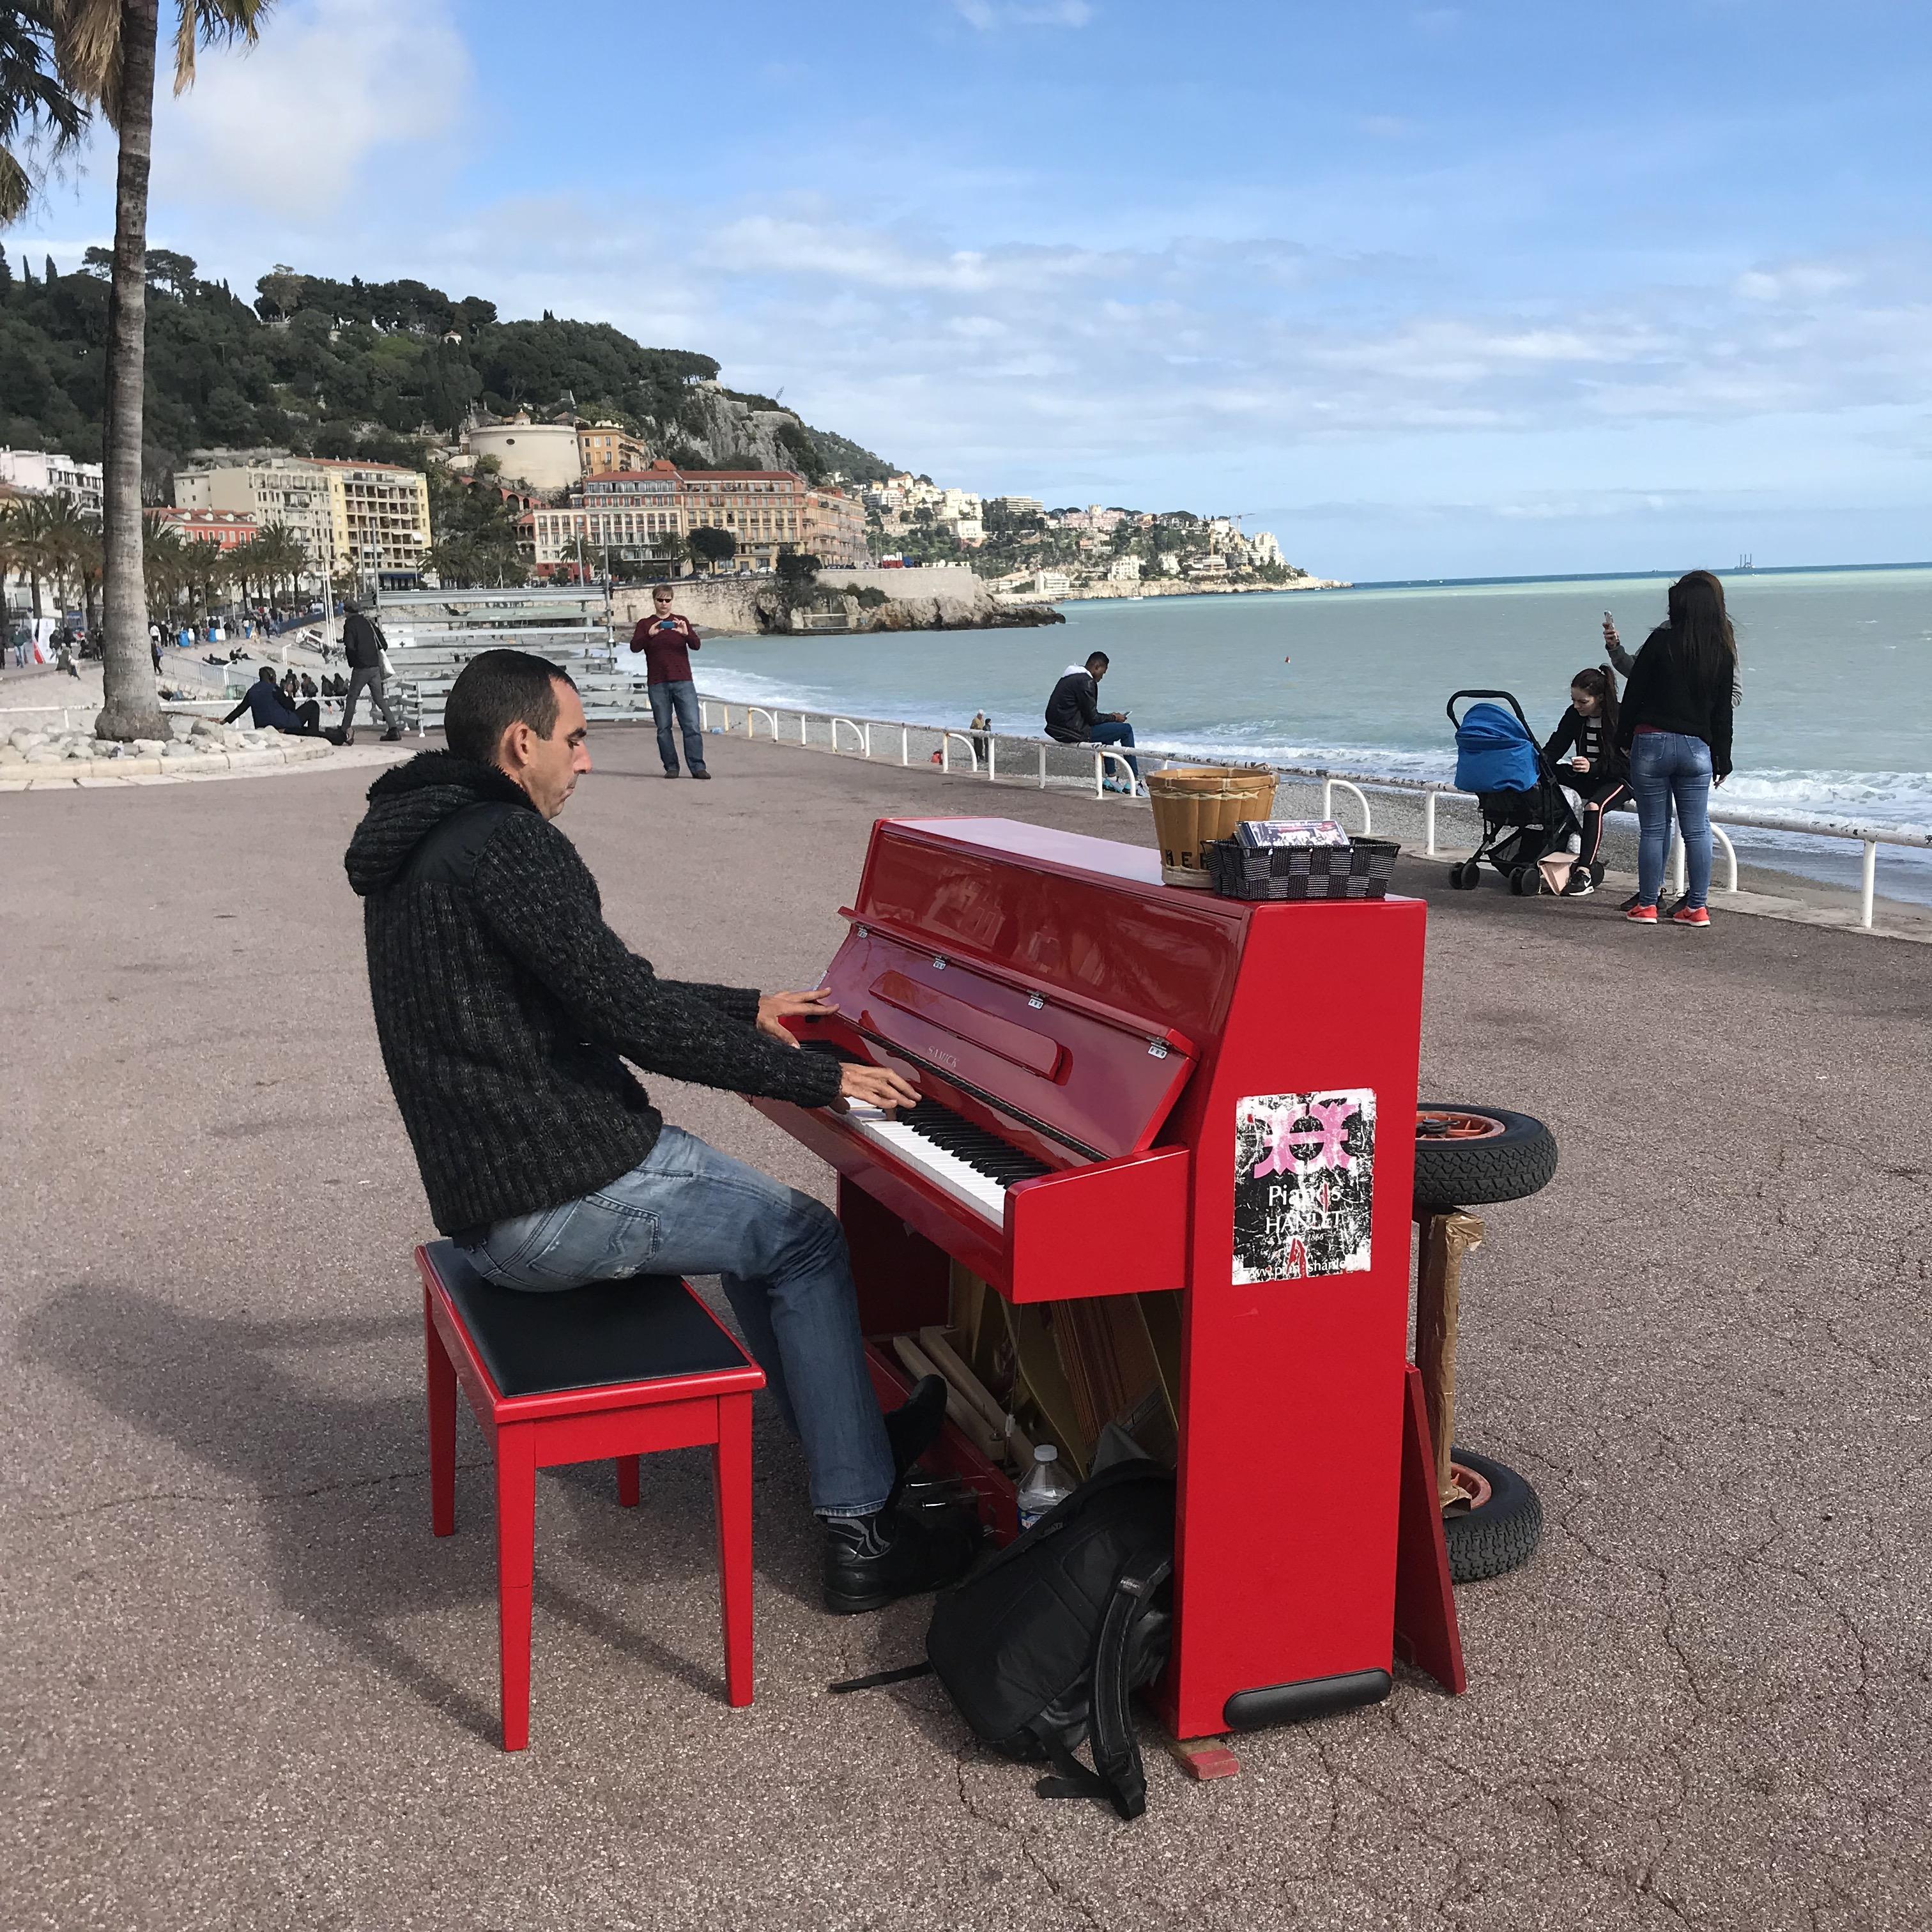 nice promenade music